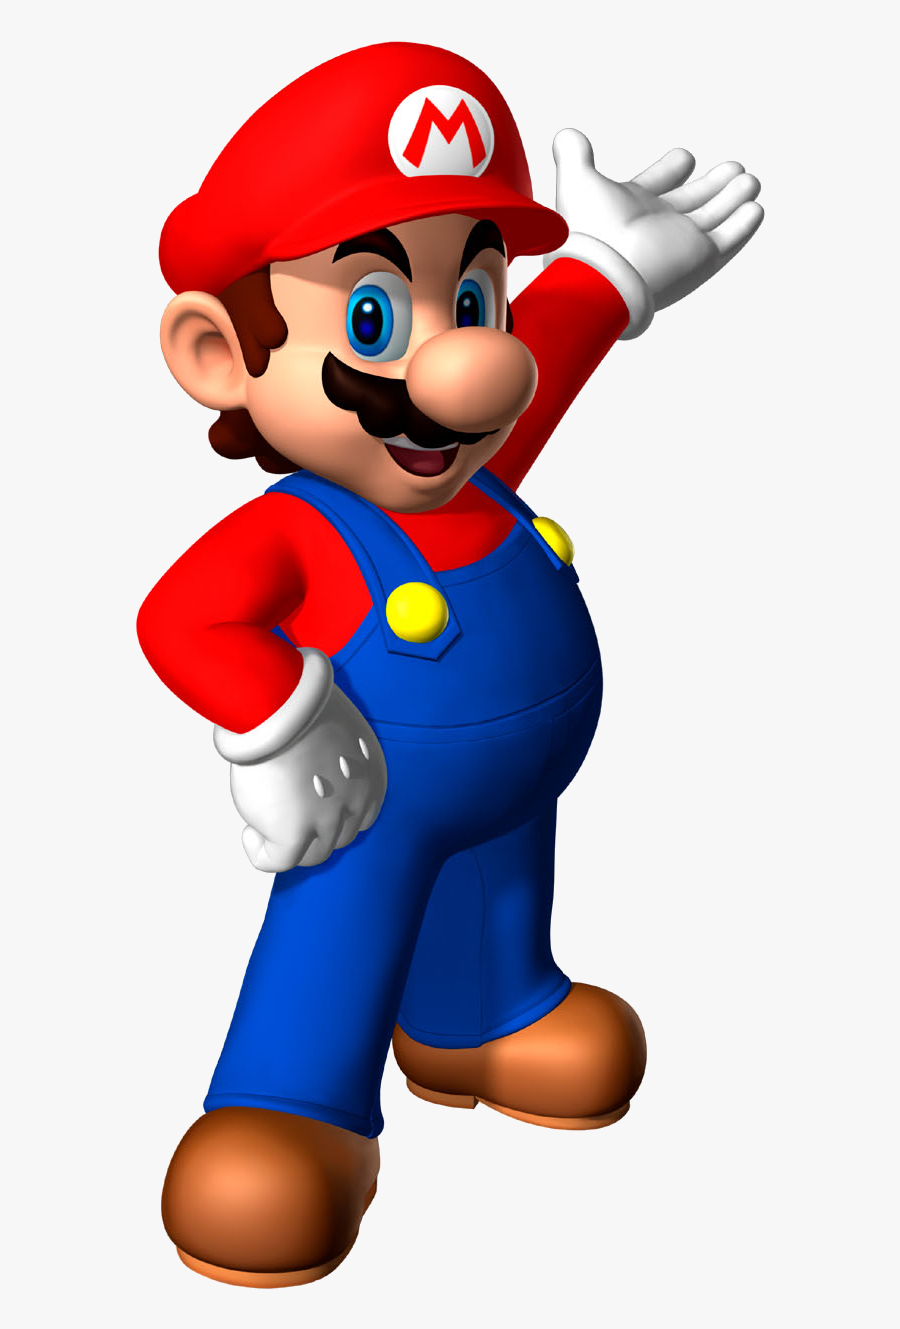 Super Smash Bros - Png Transparent Mario Bros Png, Transparent Clipart